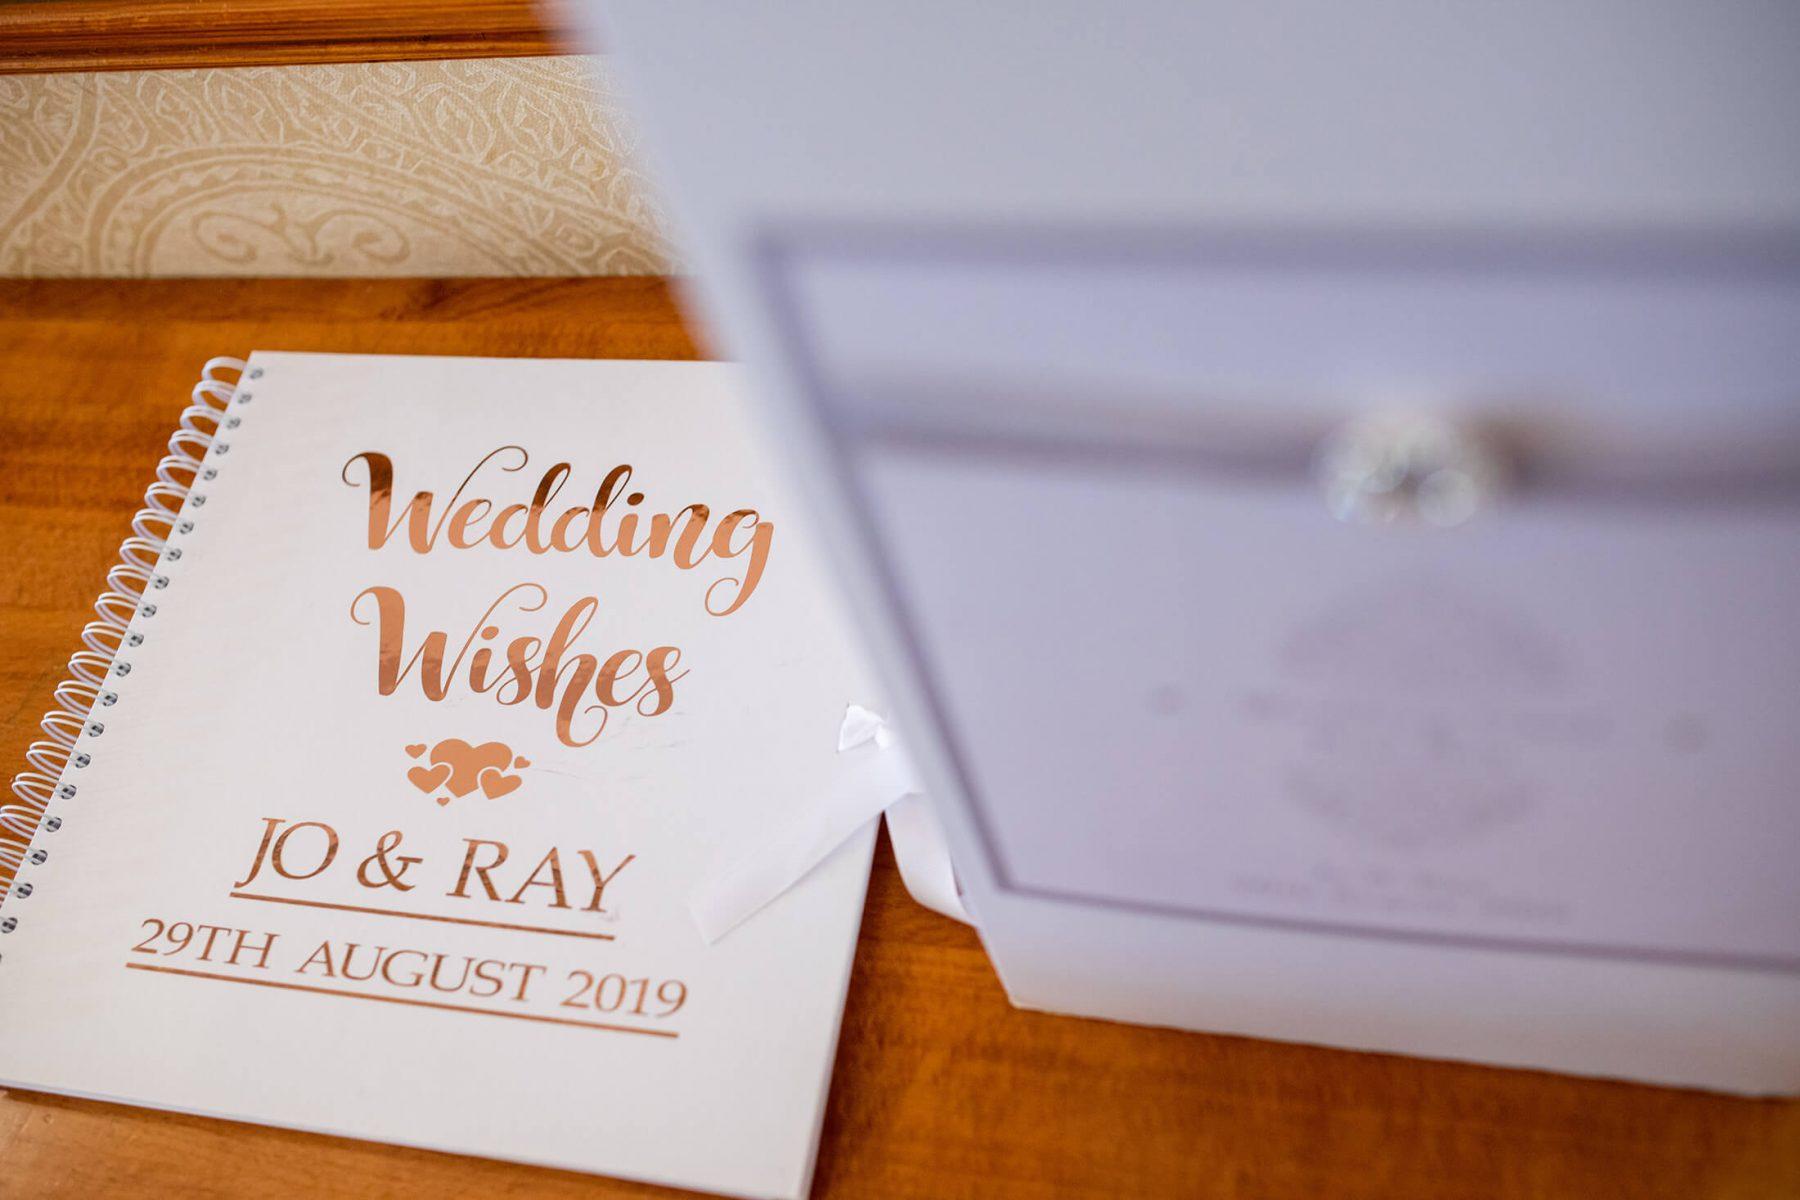 Wedding stationary at the wedding venue.